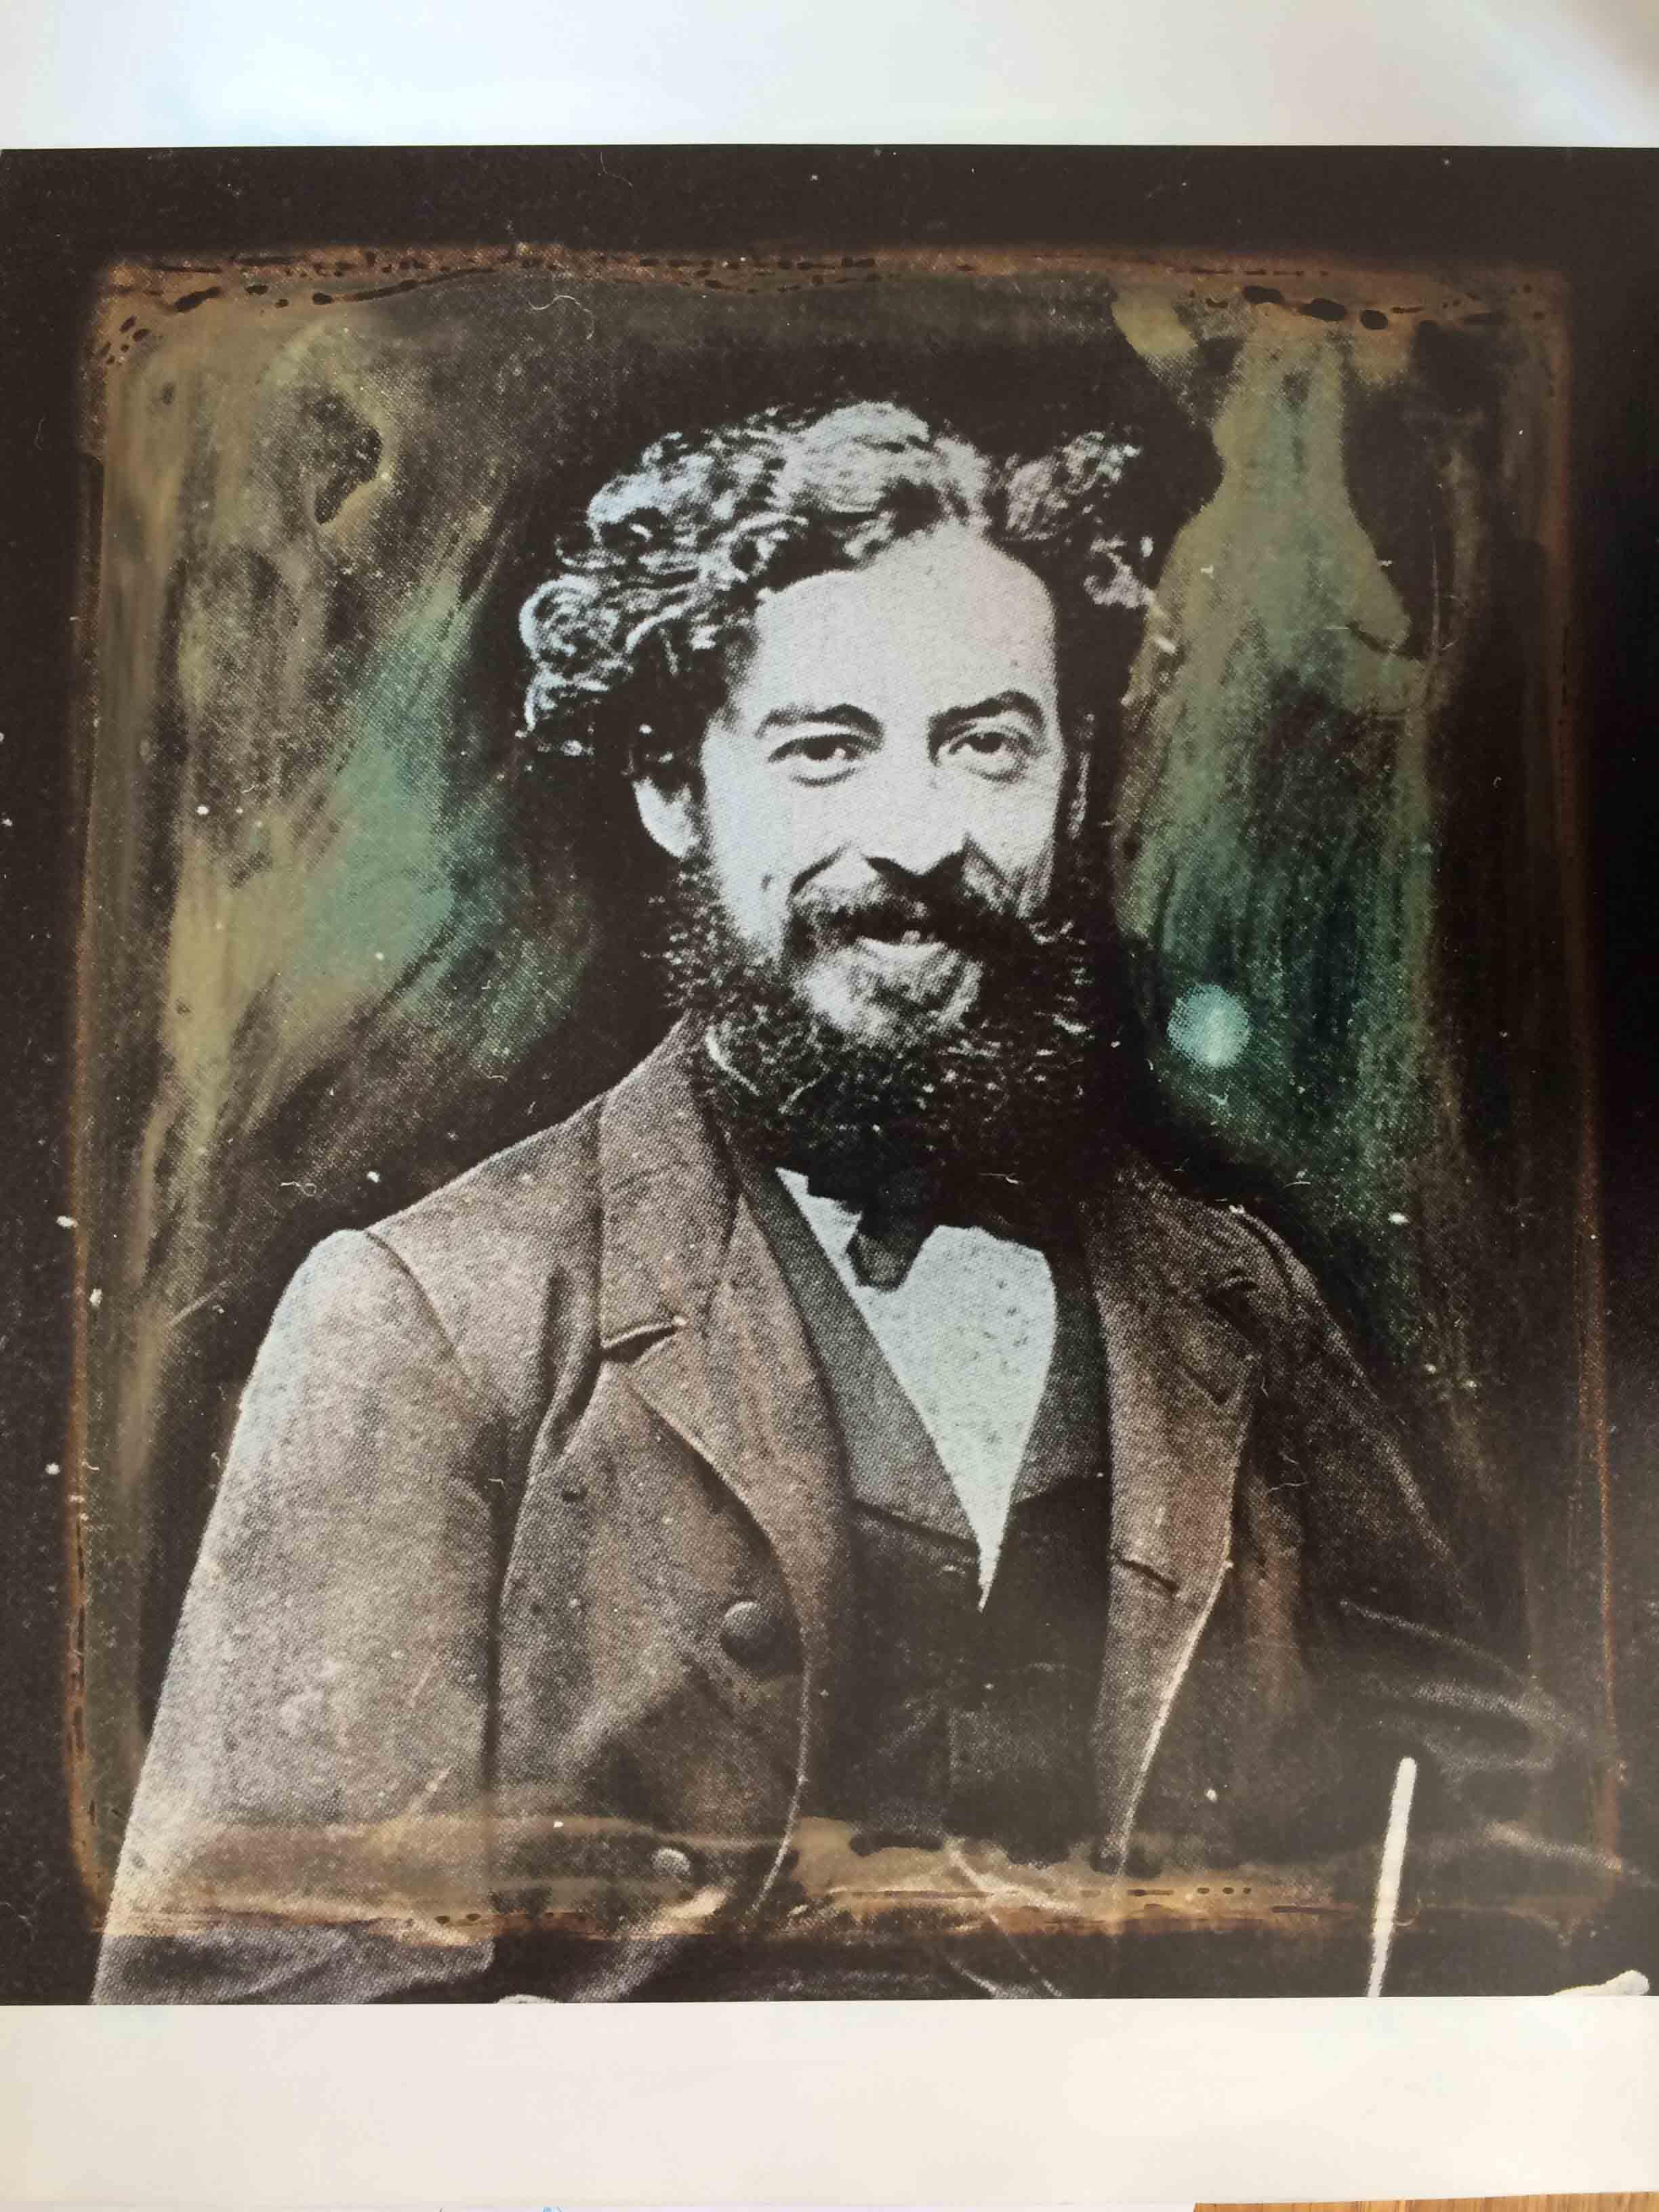 Photographie repro de Gustave Le Gray<br/>Impresión de tintas de pigmentos / Inkjet